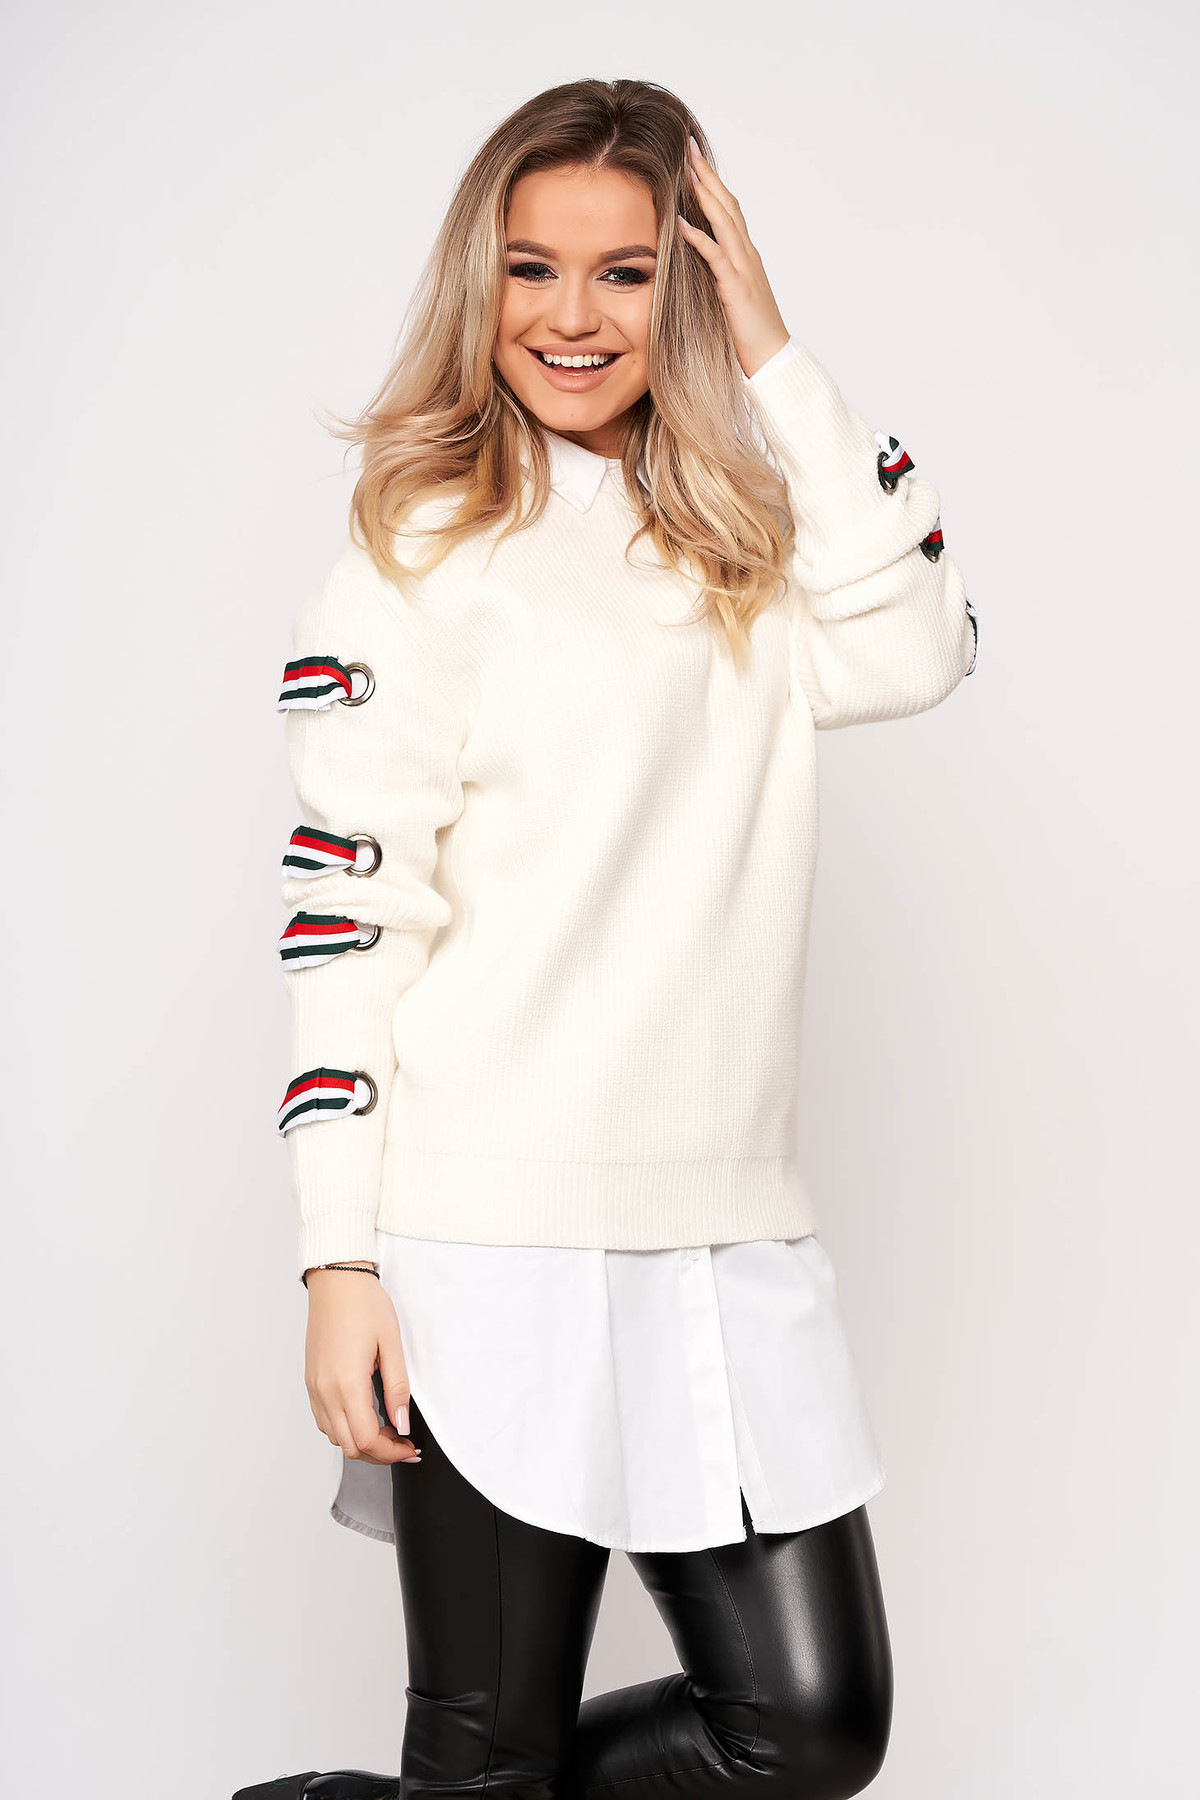 Pulover SunShine alb casual scurt din material tricotat cu croi larg cu maneci lungi si decolteu la baza gatului